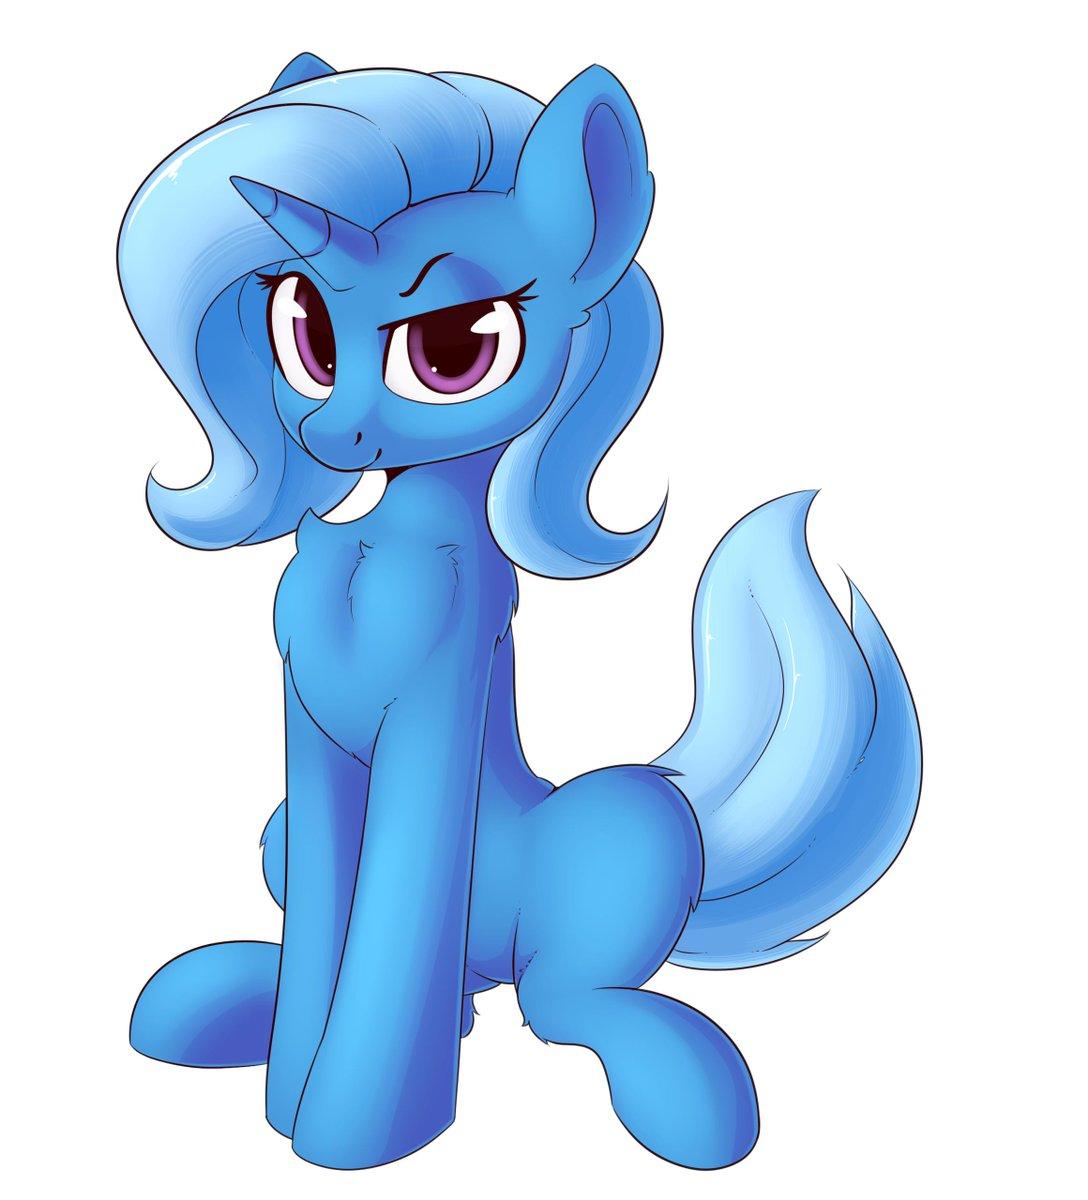 Best pony <3 #mlp #MLP #brony<br>http://pic.twitter.com/RCBUYLs6fS